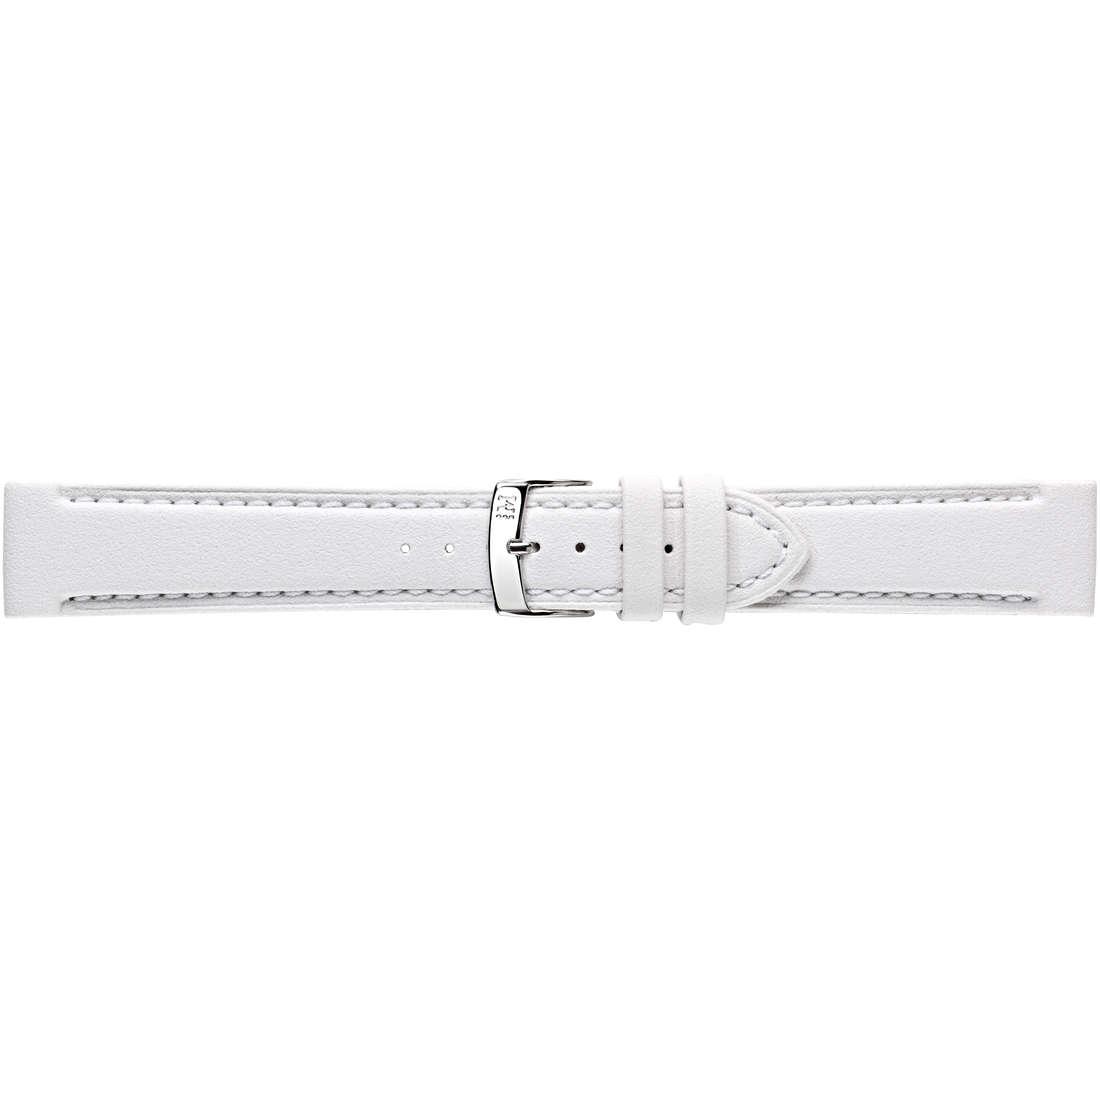 watch watch bands watch straps man Morellato Linea Sport A01U3822A42017CR20